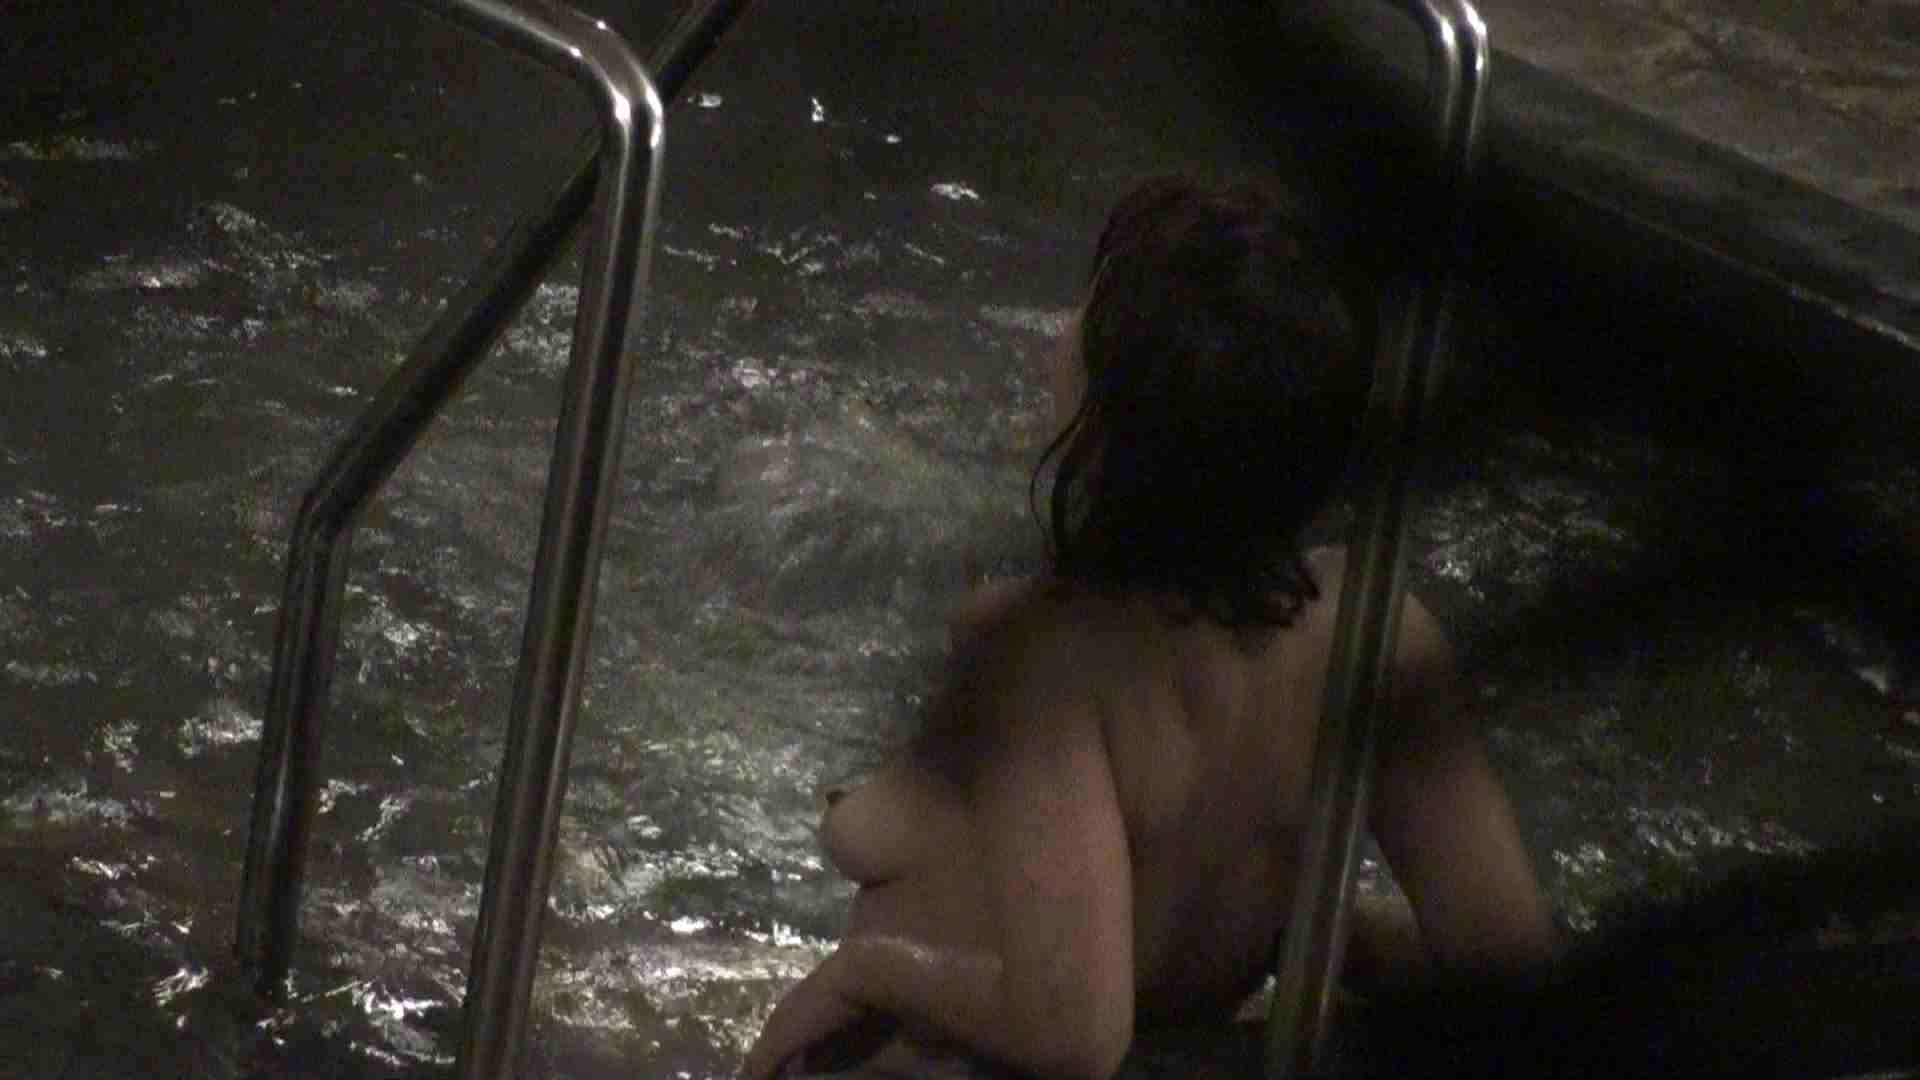 Aquaな露天風呂Vol.392 盗撮 オマンコ無修正動画無料 96画像 35